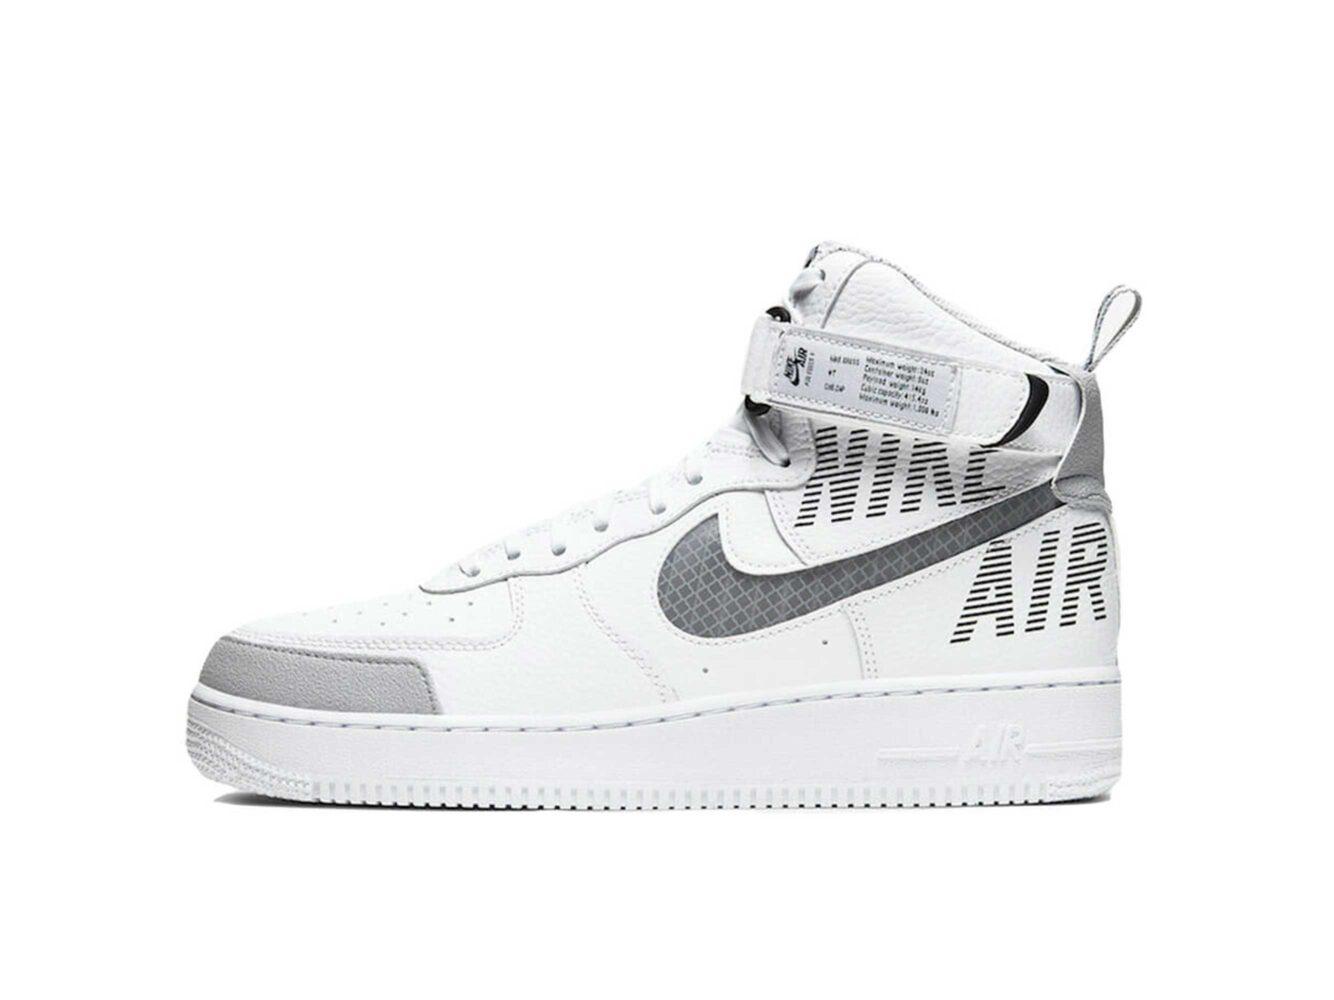 nike air force 1 high white grey CQ0449_100 купить